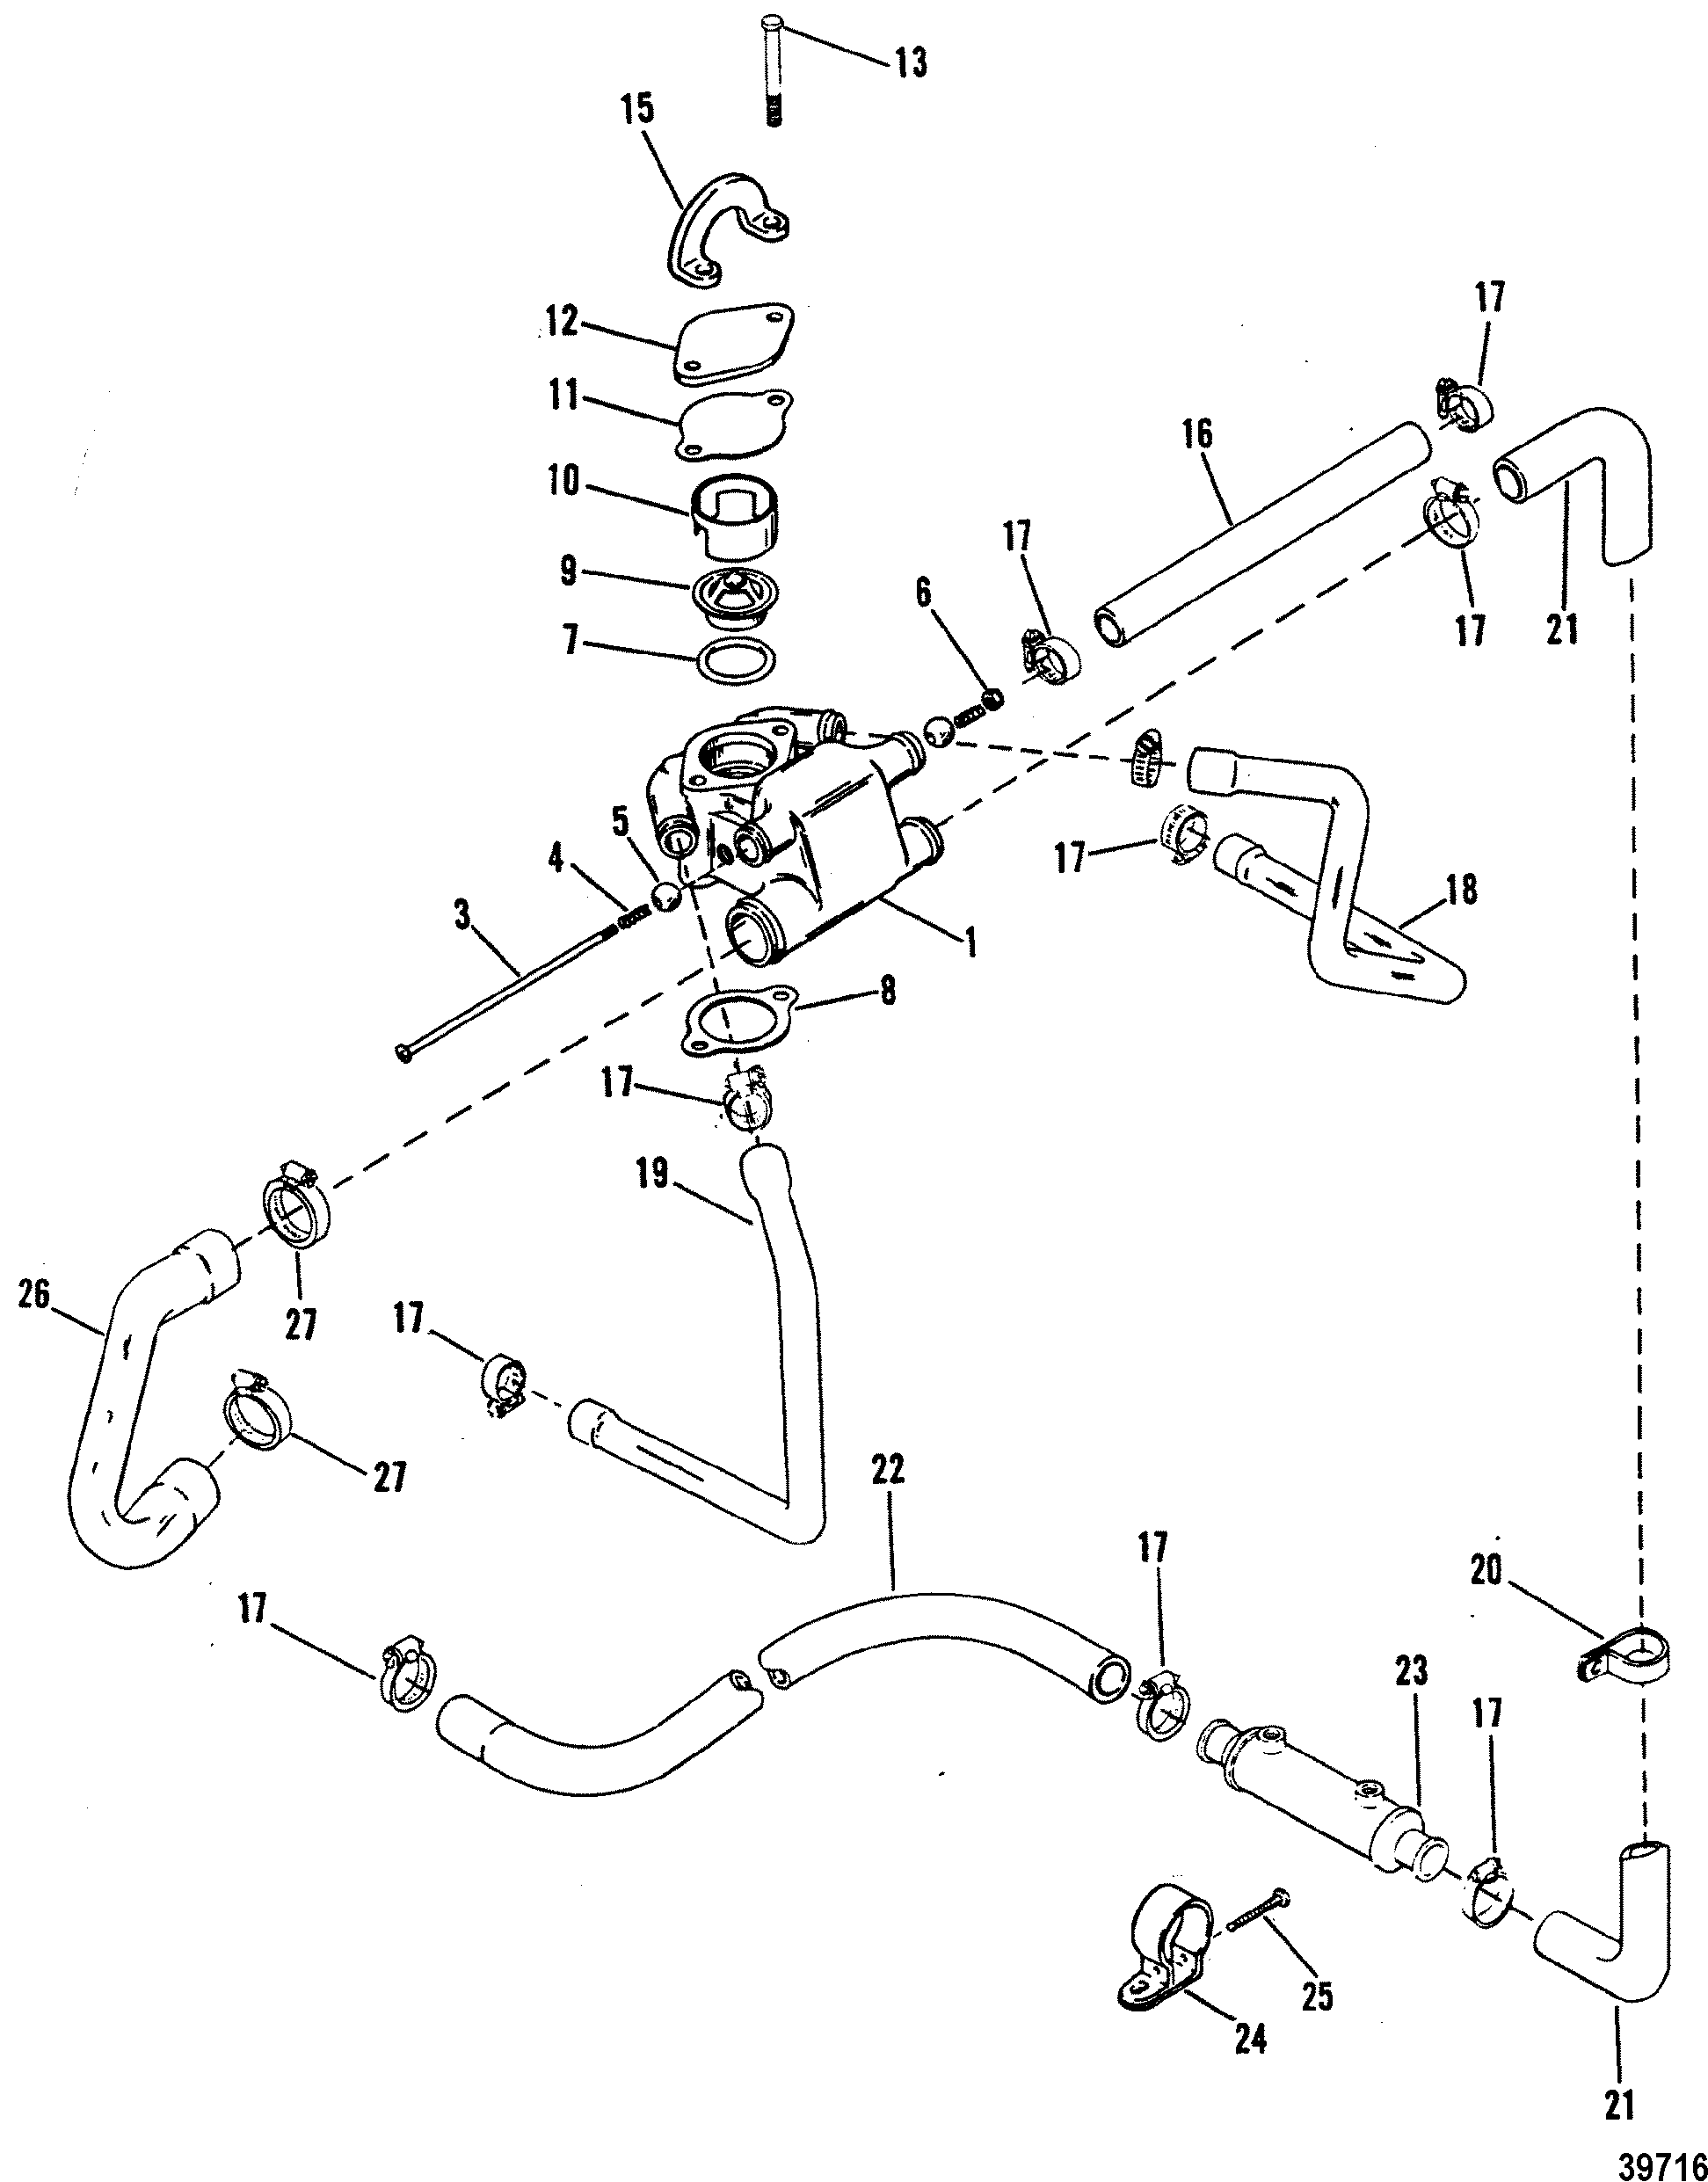 Mercruiser 43lx Gen Ii 4 Bbl Gm 1978 898 Wiring Diagram Standard Cooling System